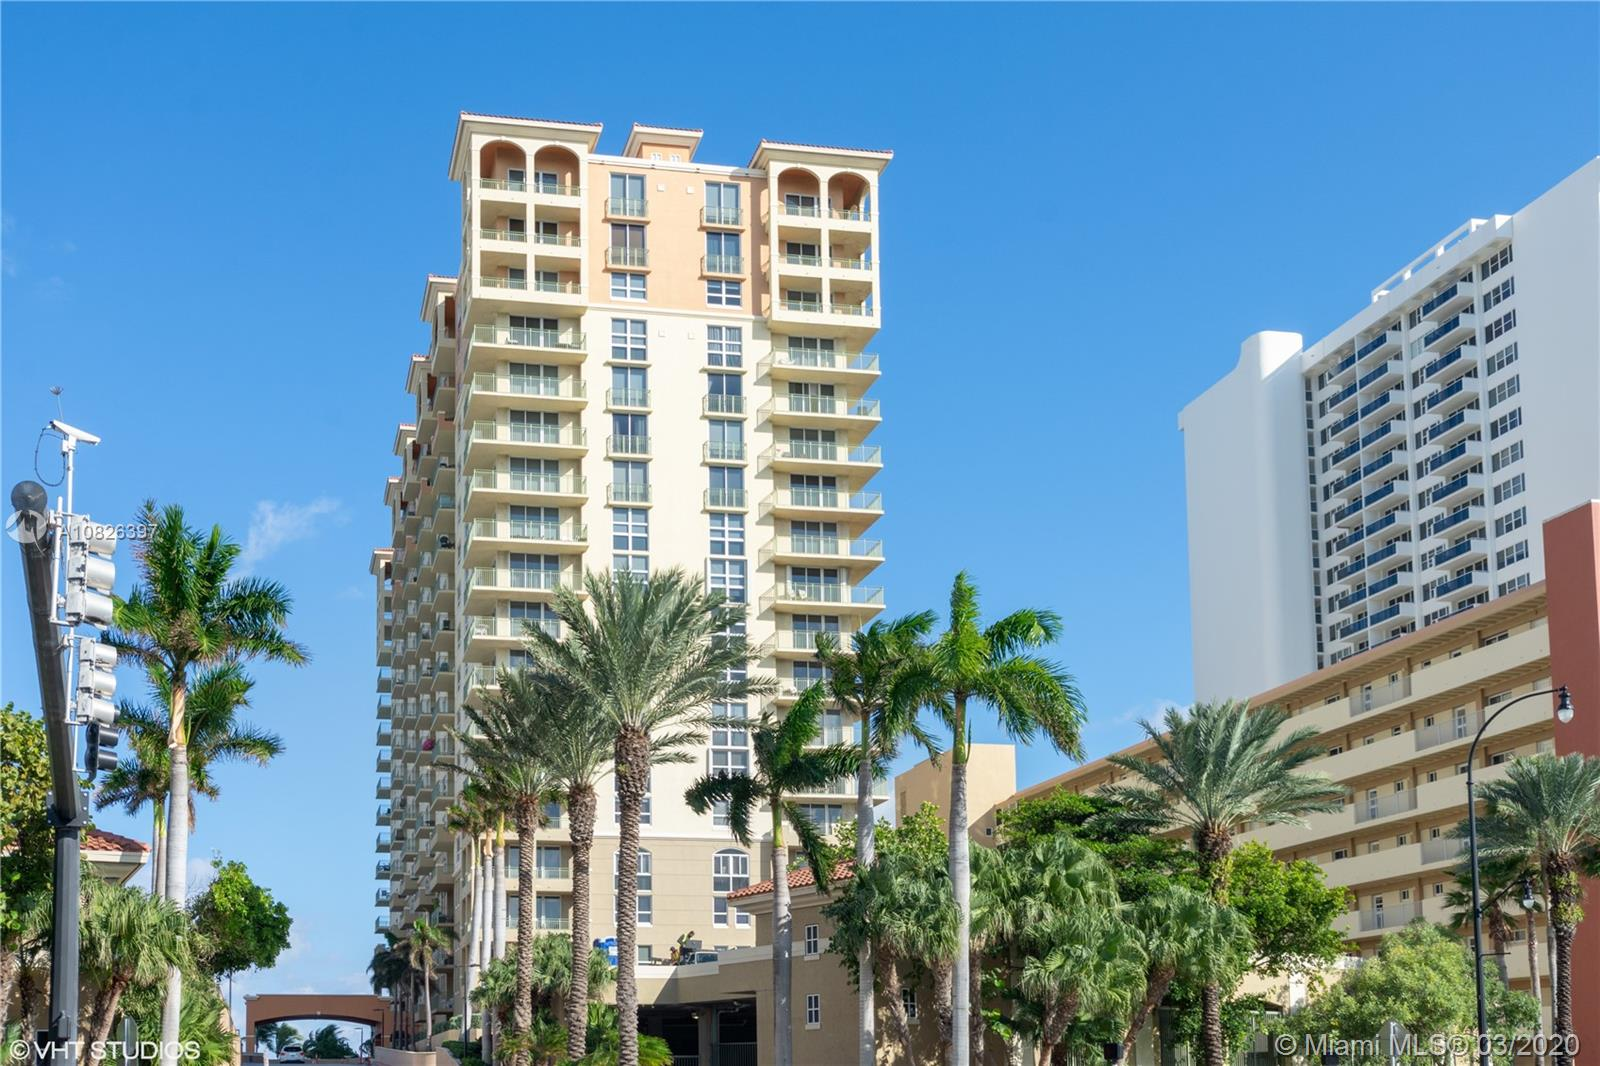 2080 OCEAN DR # 1503, Hallandale Beach, Florida 33009, 2 Bedrooms Bedrooms, ,2 BathroomsBathrooms,Residential Lease,For Rent,2080 OCEAN DR # 1503,A10826397